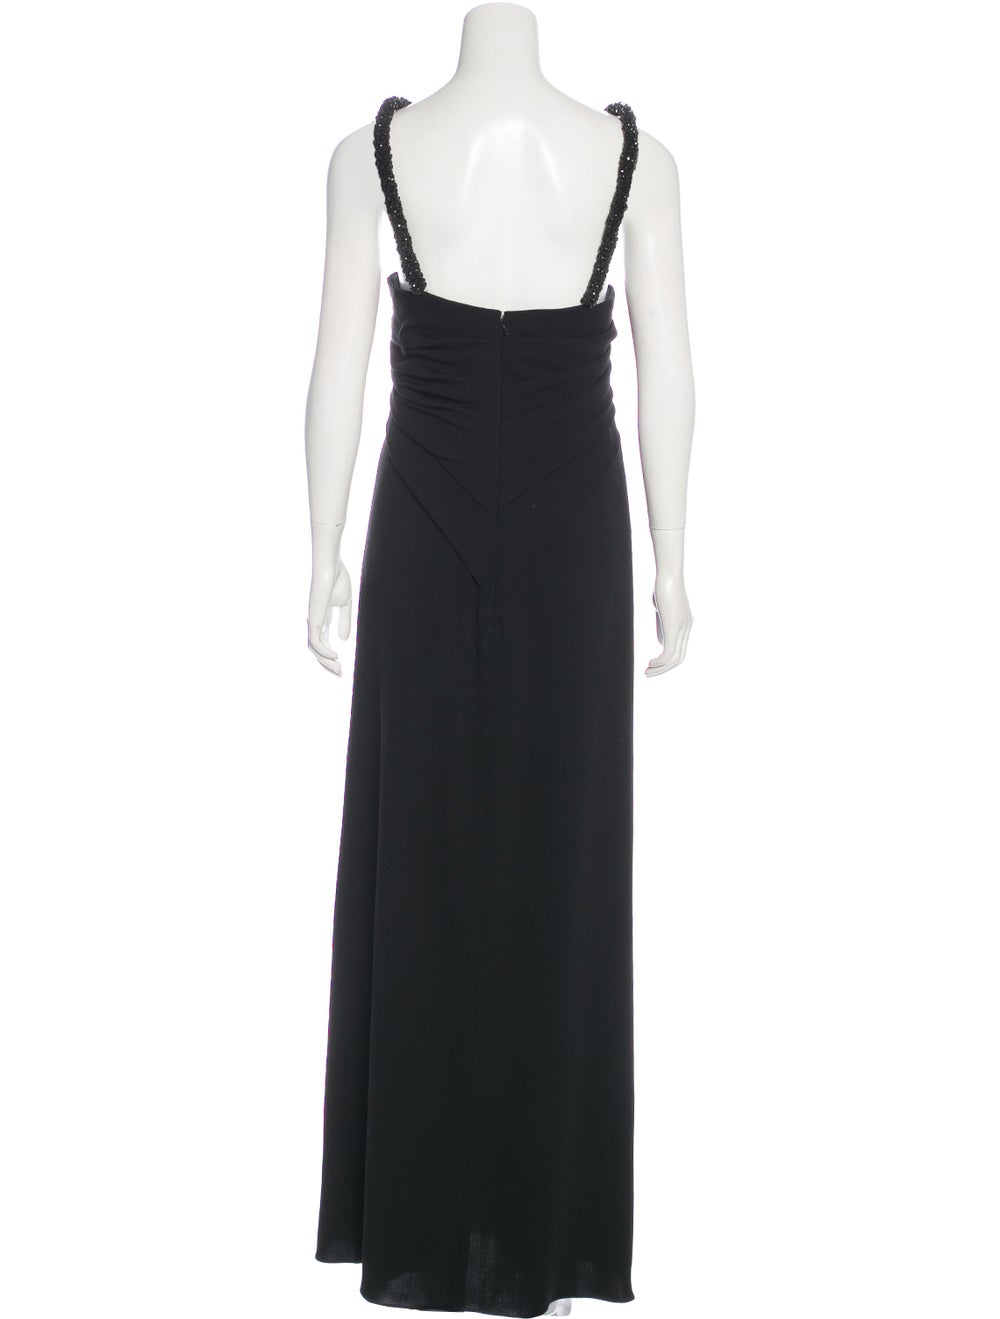 Oscar de la Renta Sleeveless Maxi Dress Black - image 3